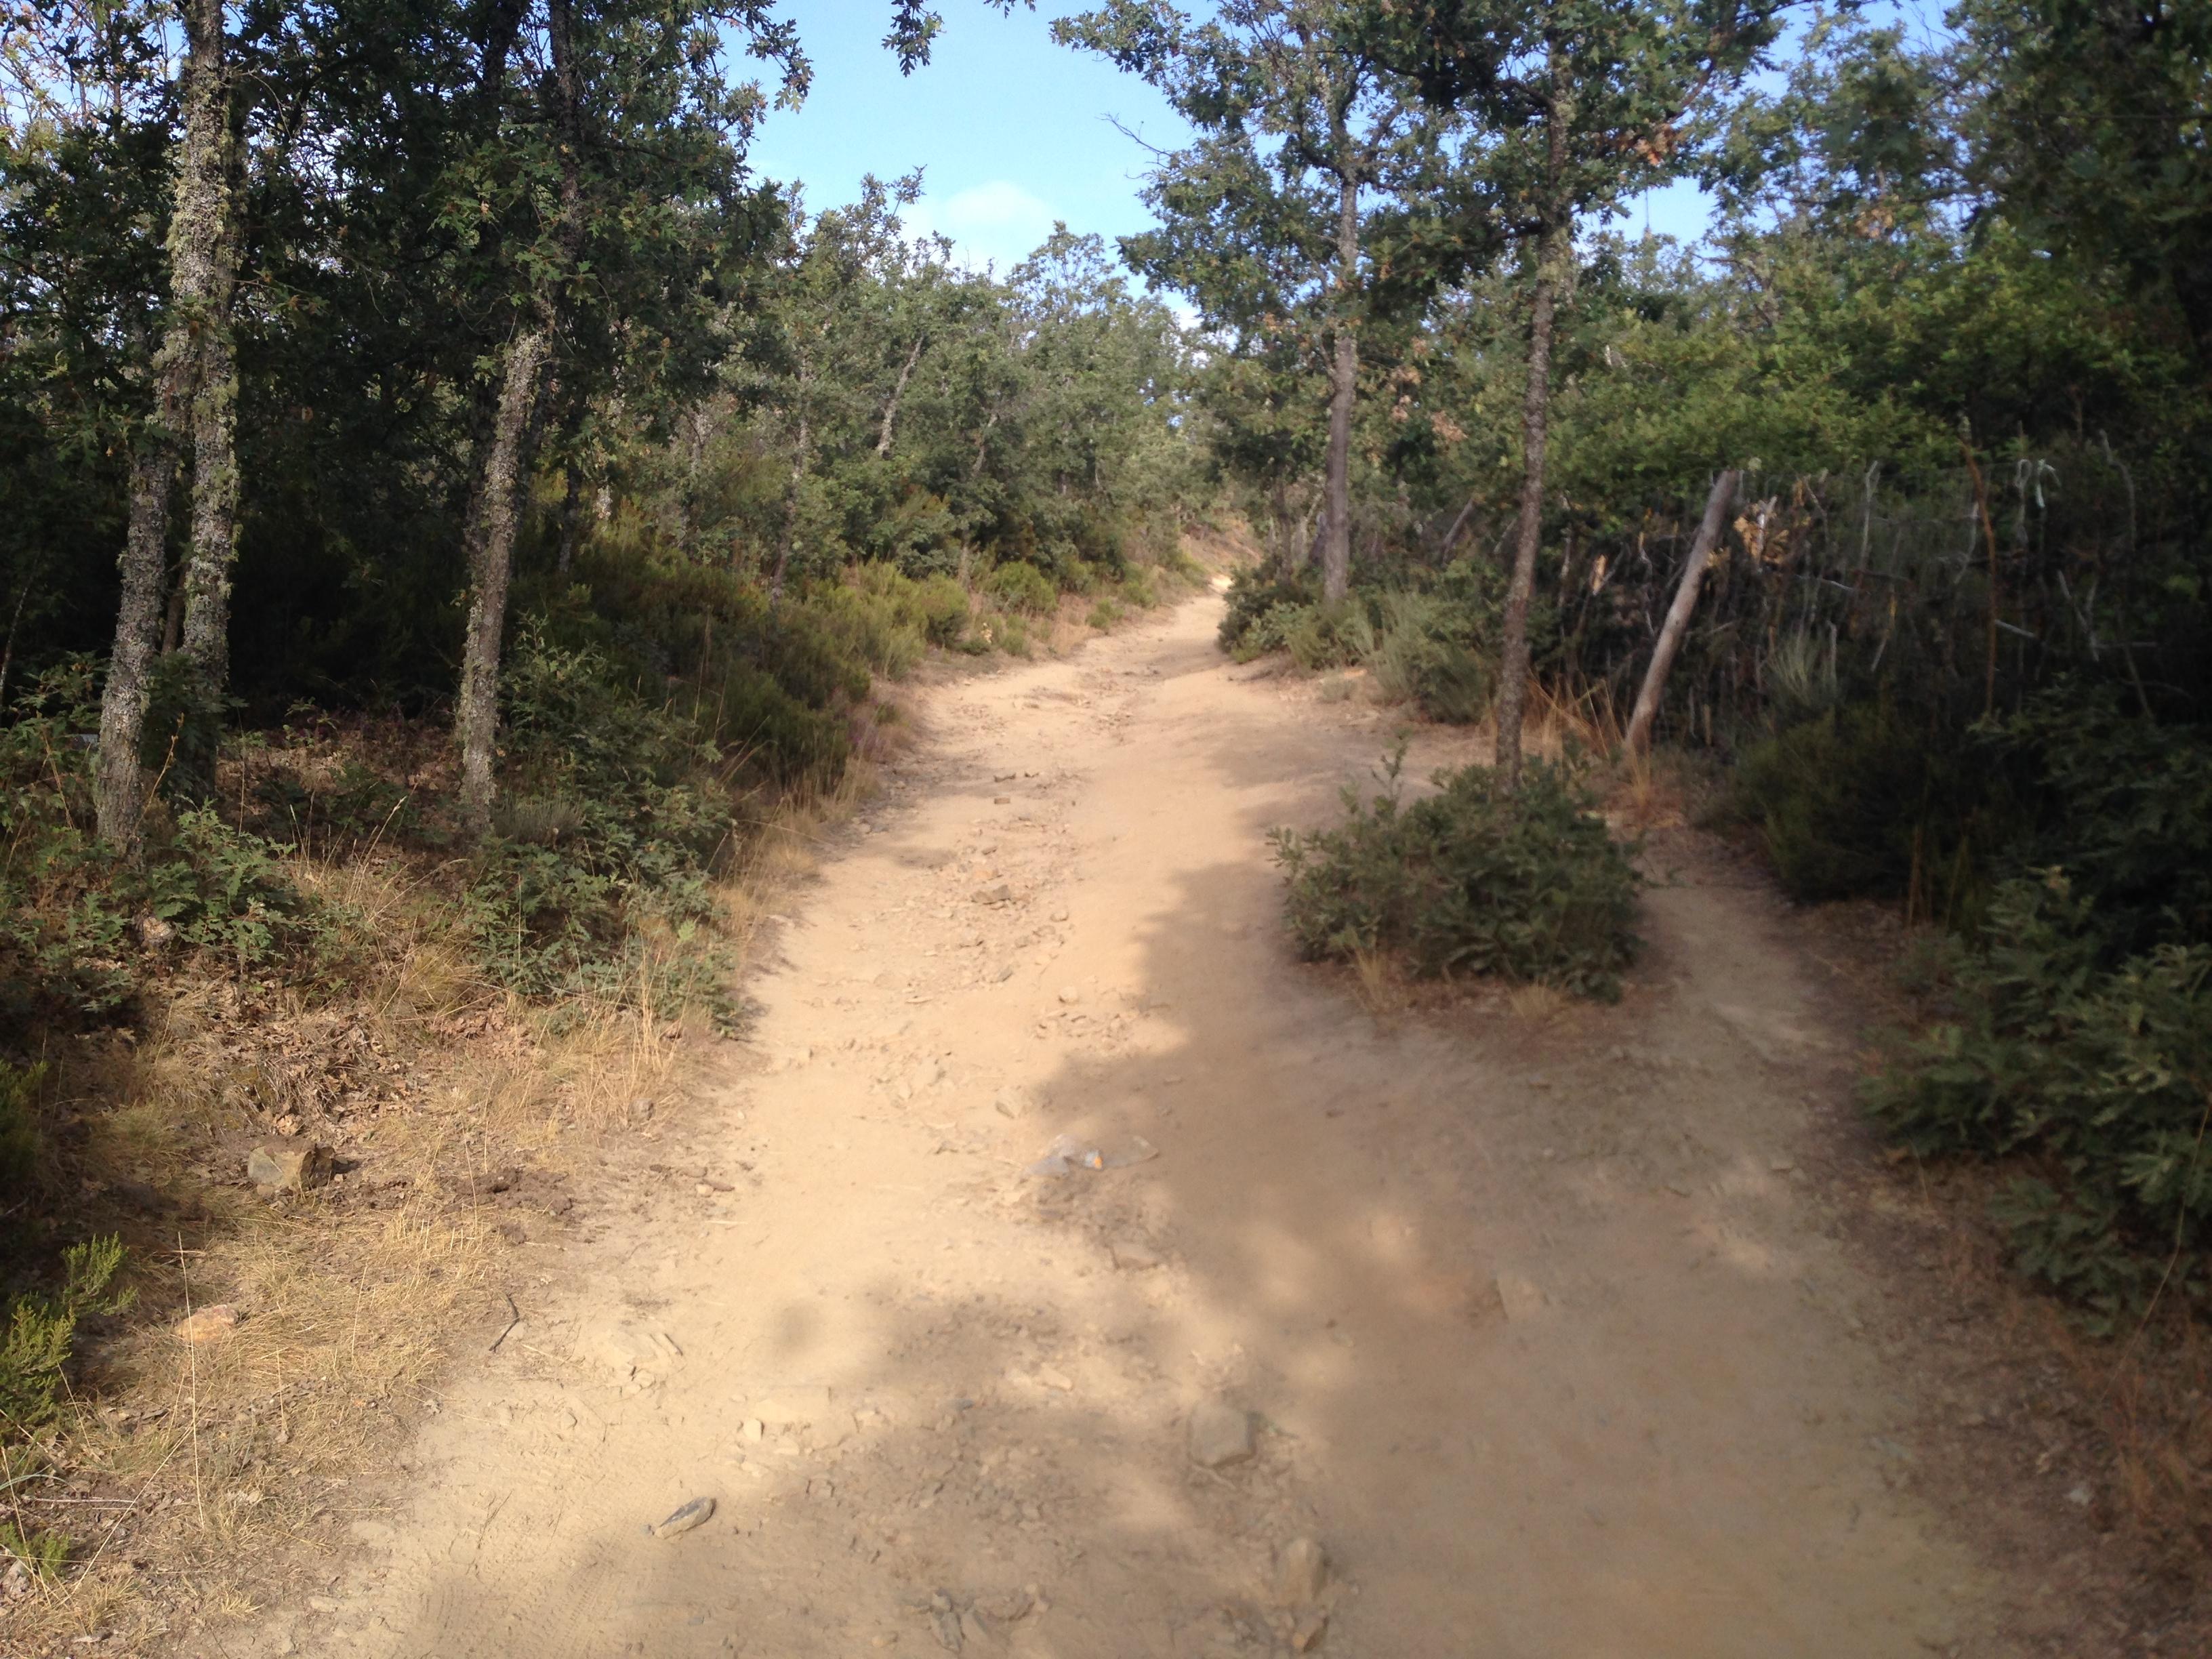 camino de santiago iphone 2014 904 IMG_5342.jpg